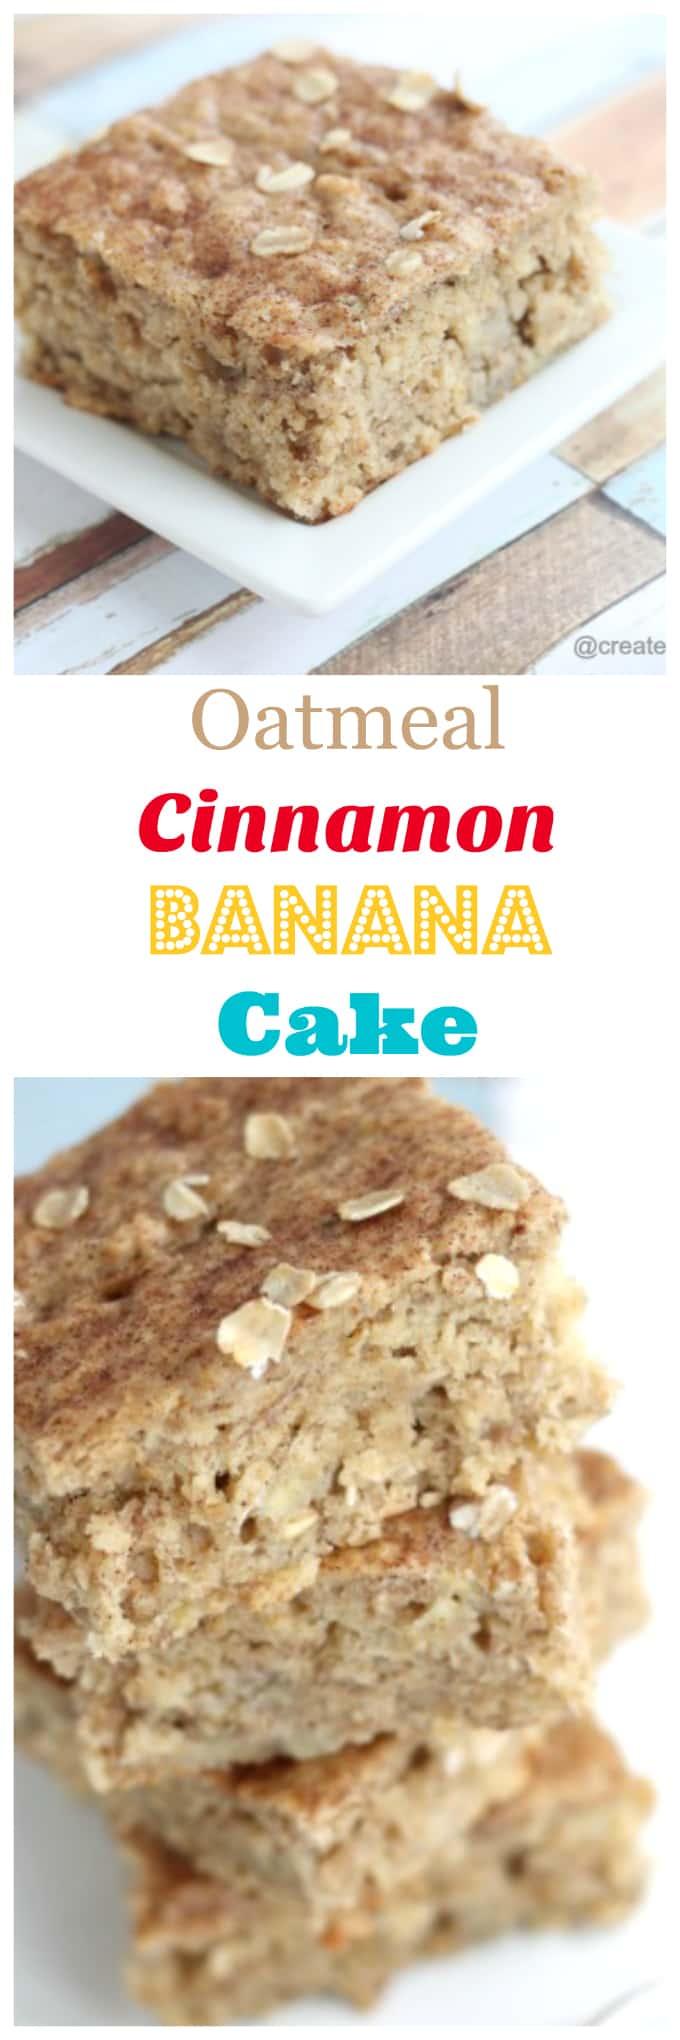 oatmeal cinnamon banana cake @createdbydiane